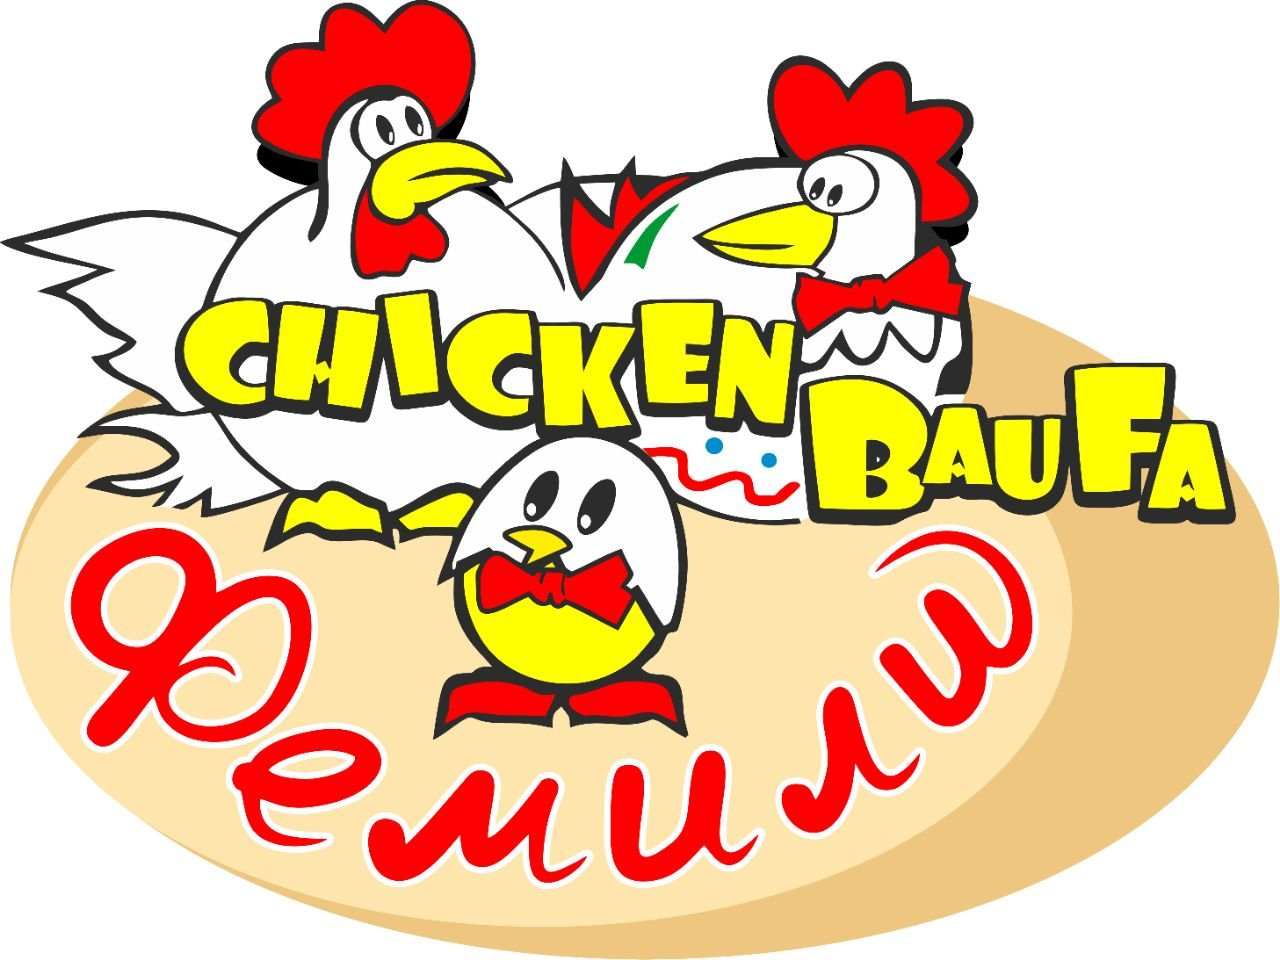 ChickenBauFa